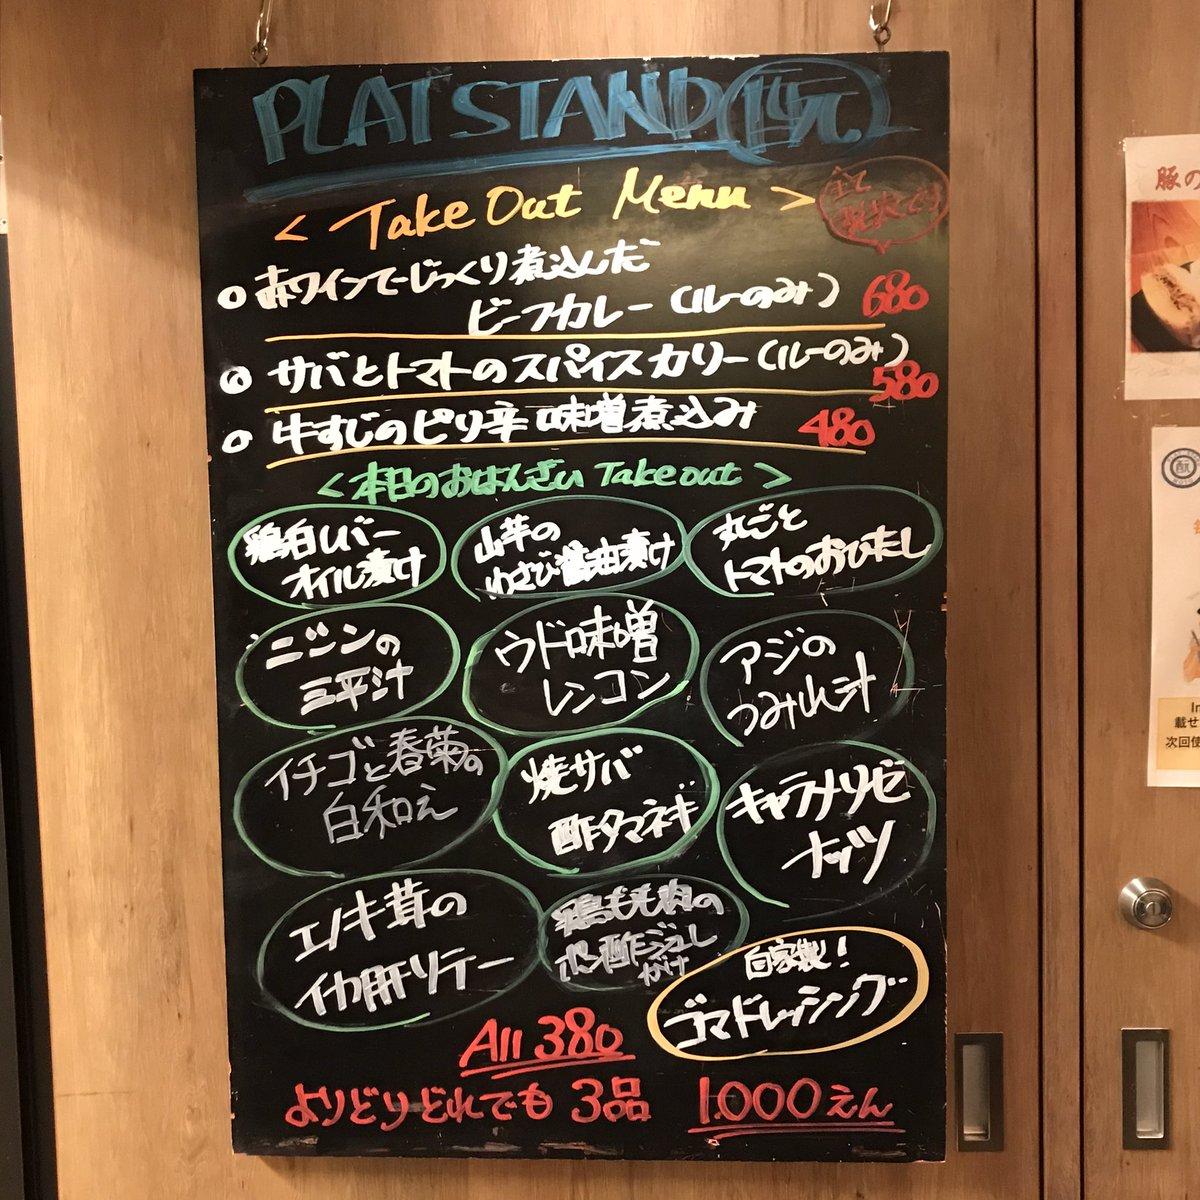 test ツイッターメディア - 吉祥寺もと 蒸し暑いこんな日は日本酒で涼みませんか🎐 イチオシは『謙信』 愛山米らしいほのかにベリーの様な香りと、奥行きのある旨味 キレの良さも素晴らしく、ついつい杯がすすんでしまいますね🍶  🦅スタッフタカの新メニュー🦅 エビとアボカドの揚げ春巻き スイートチリソースにつけてぜひ🦐 https://t.co/dJ9vnwu33P